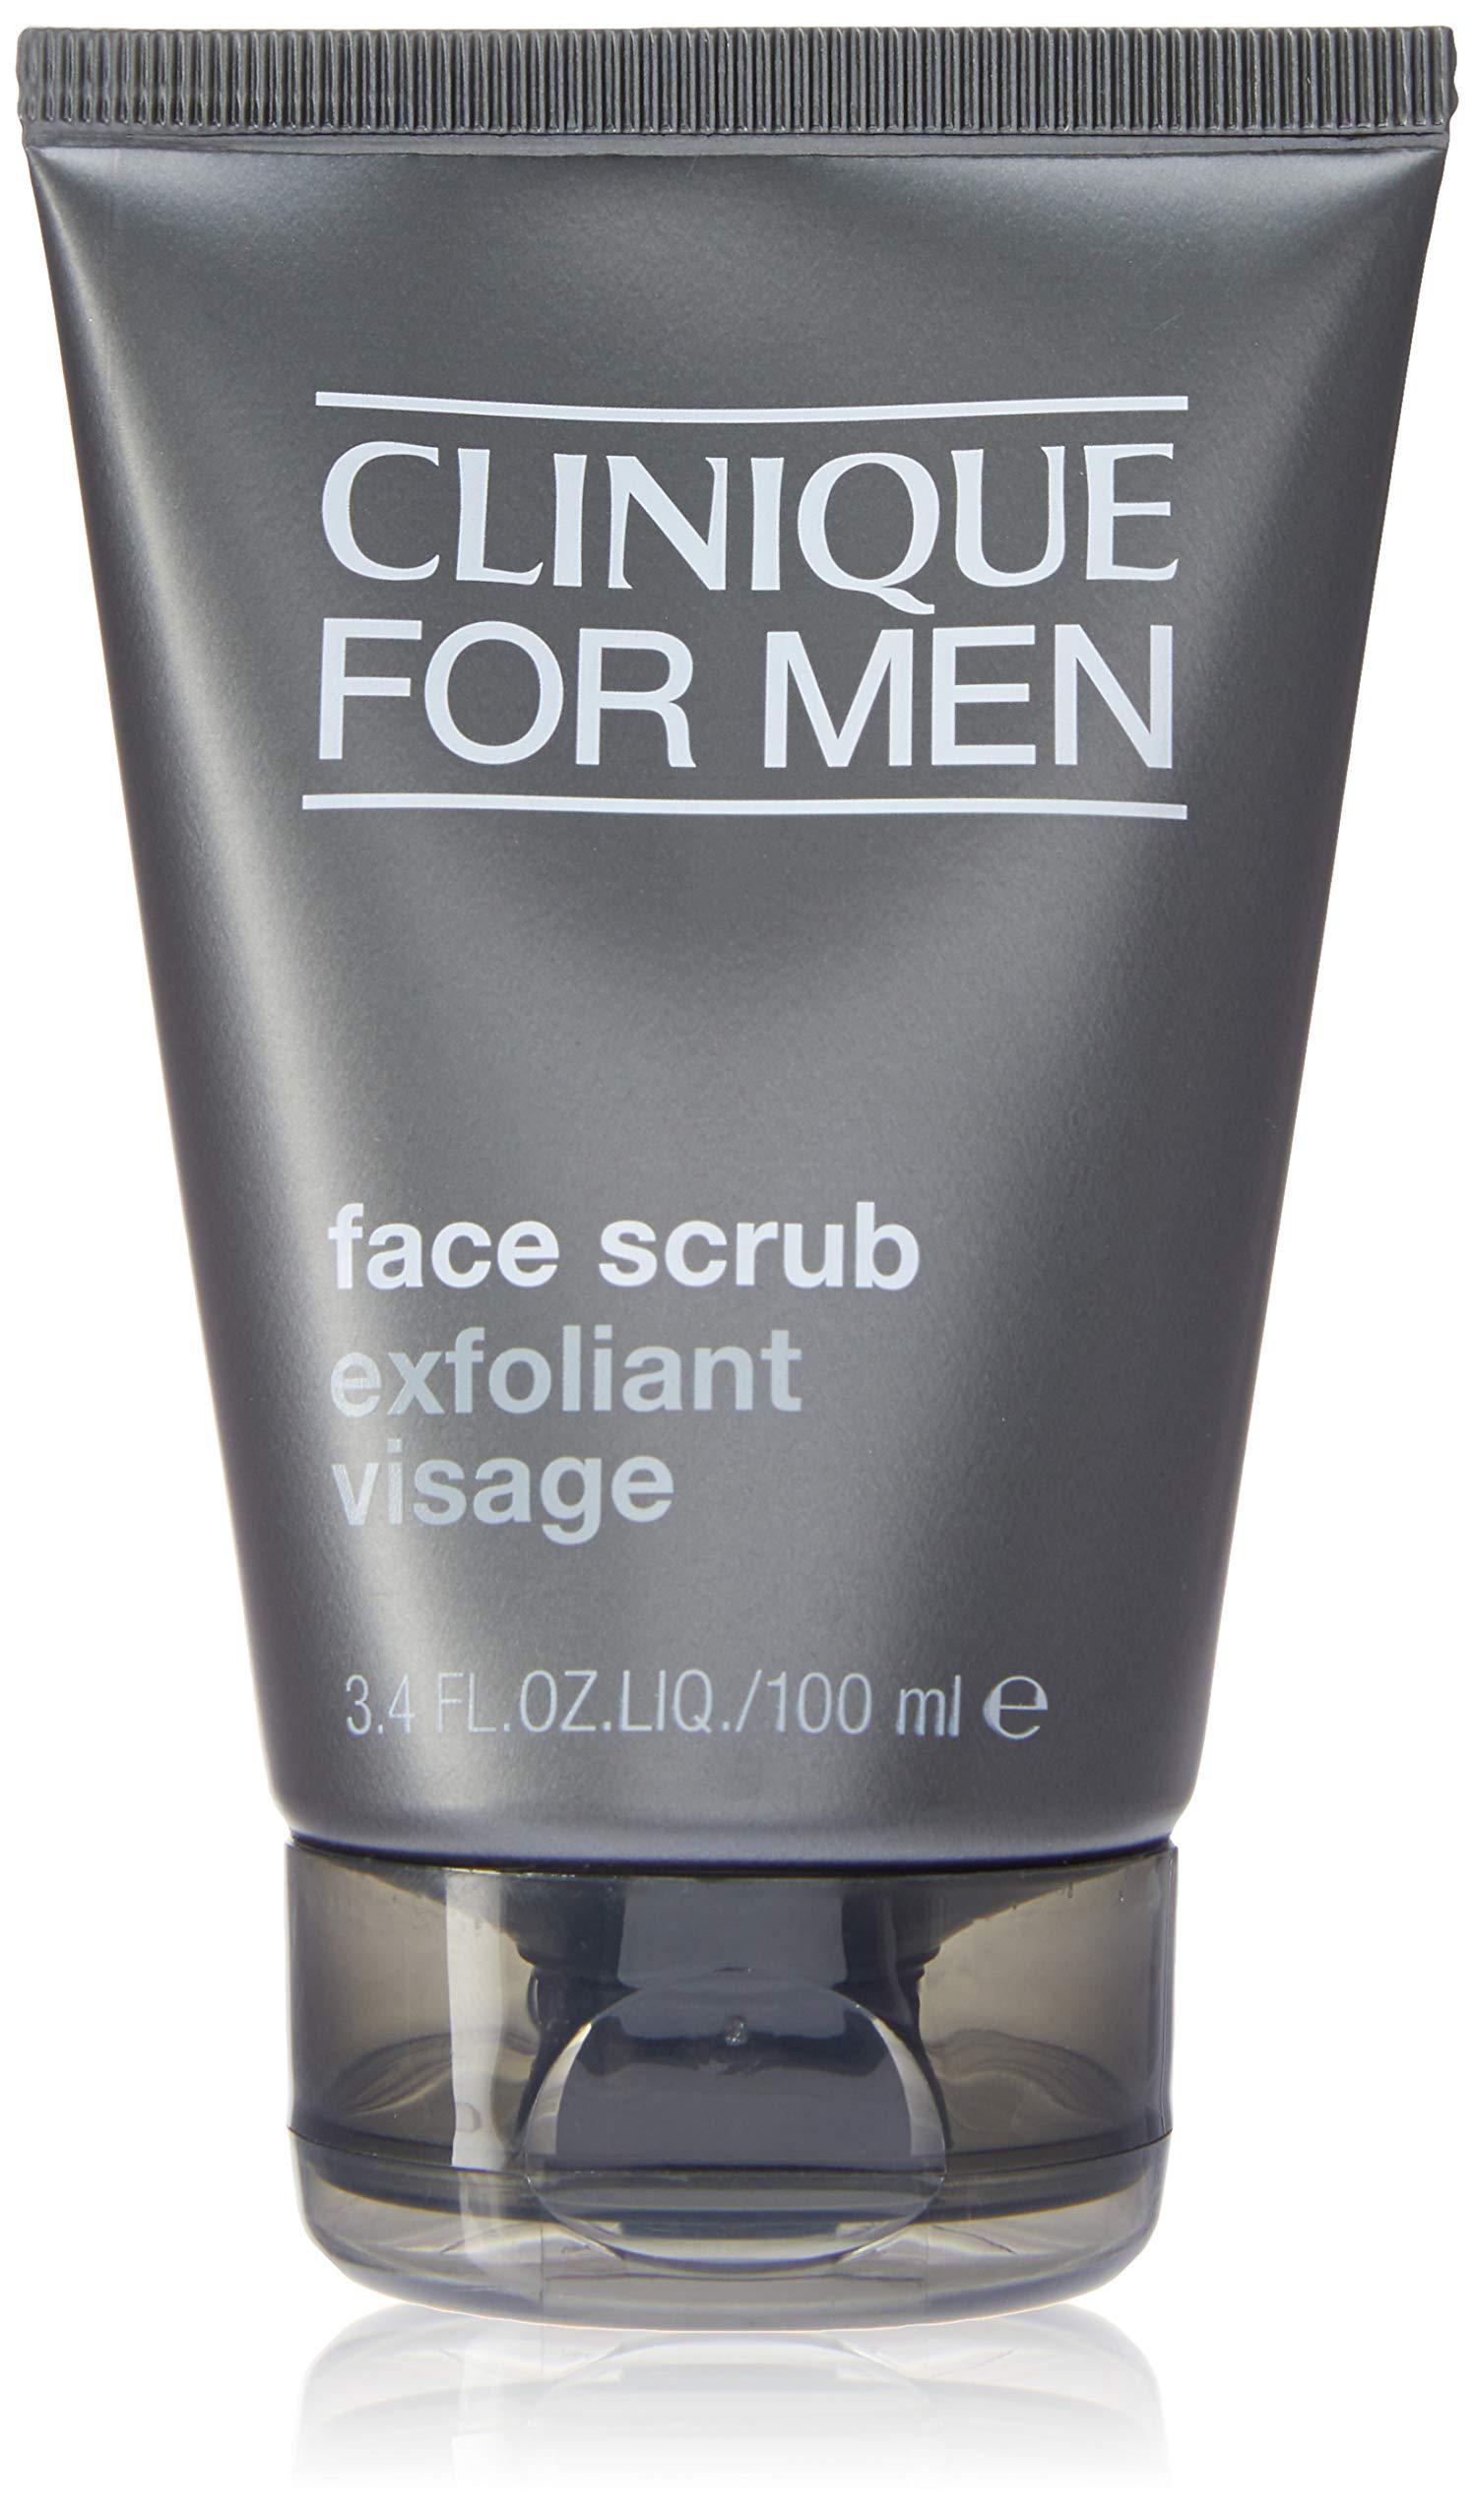 Clinique For Men Face Scrub 3.4 oz by Clinique